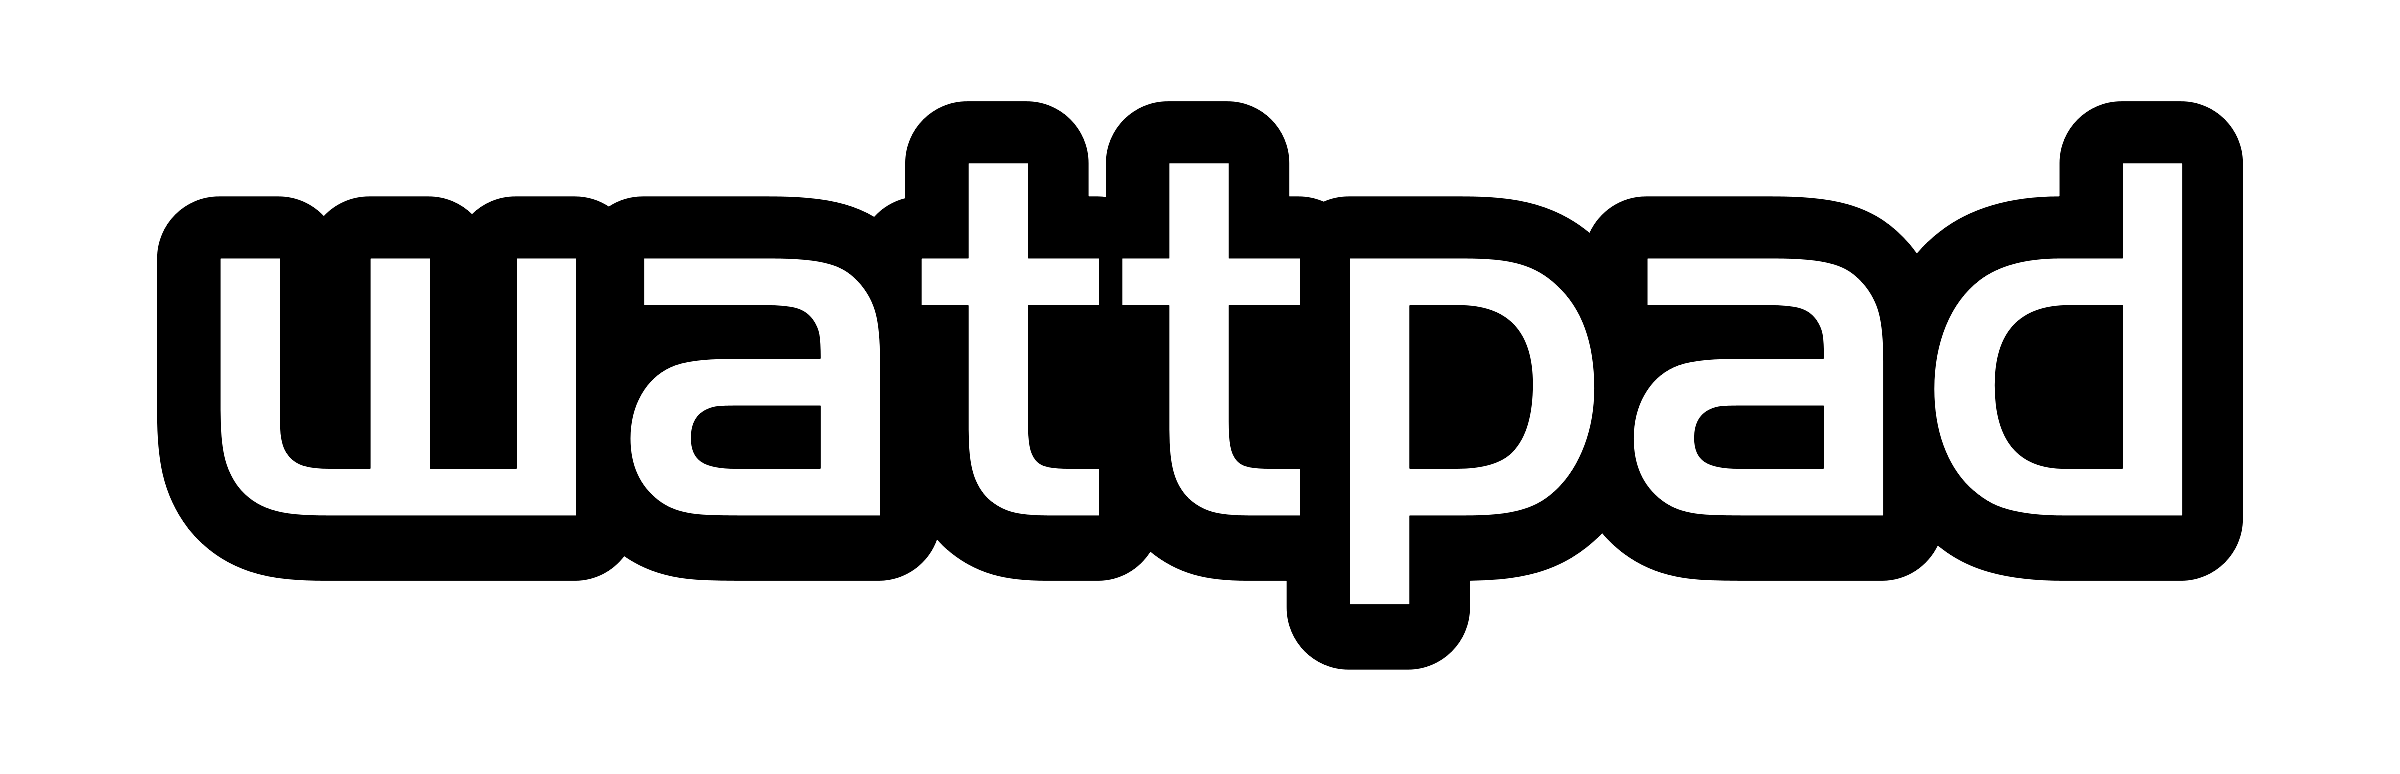 Wattpad Logo PNG Transparent & SVG Vector - Freebie Supply